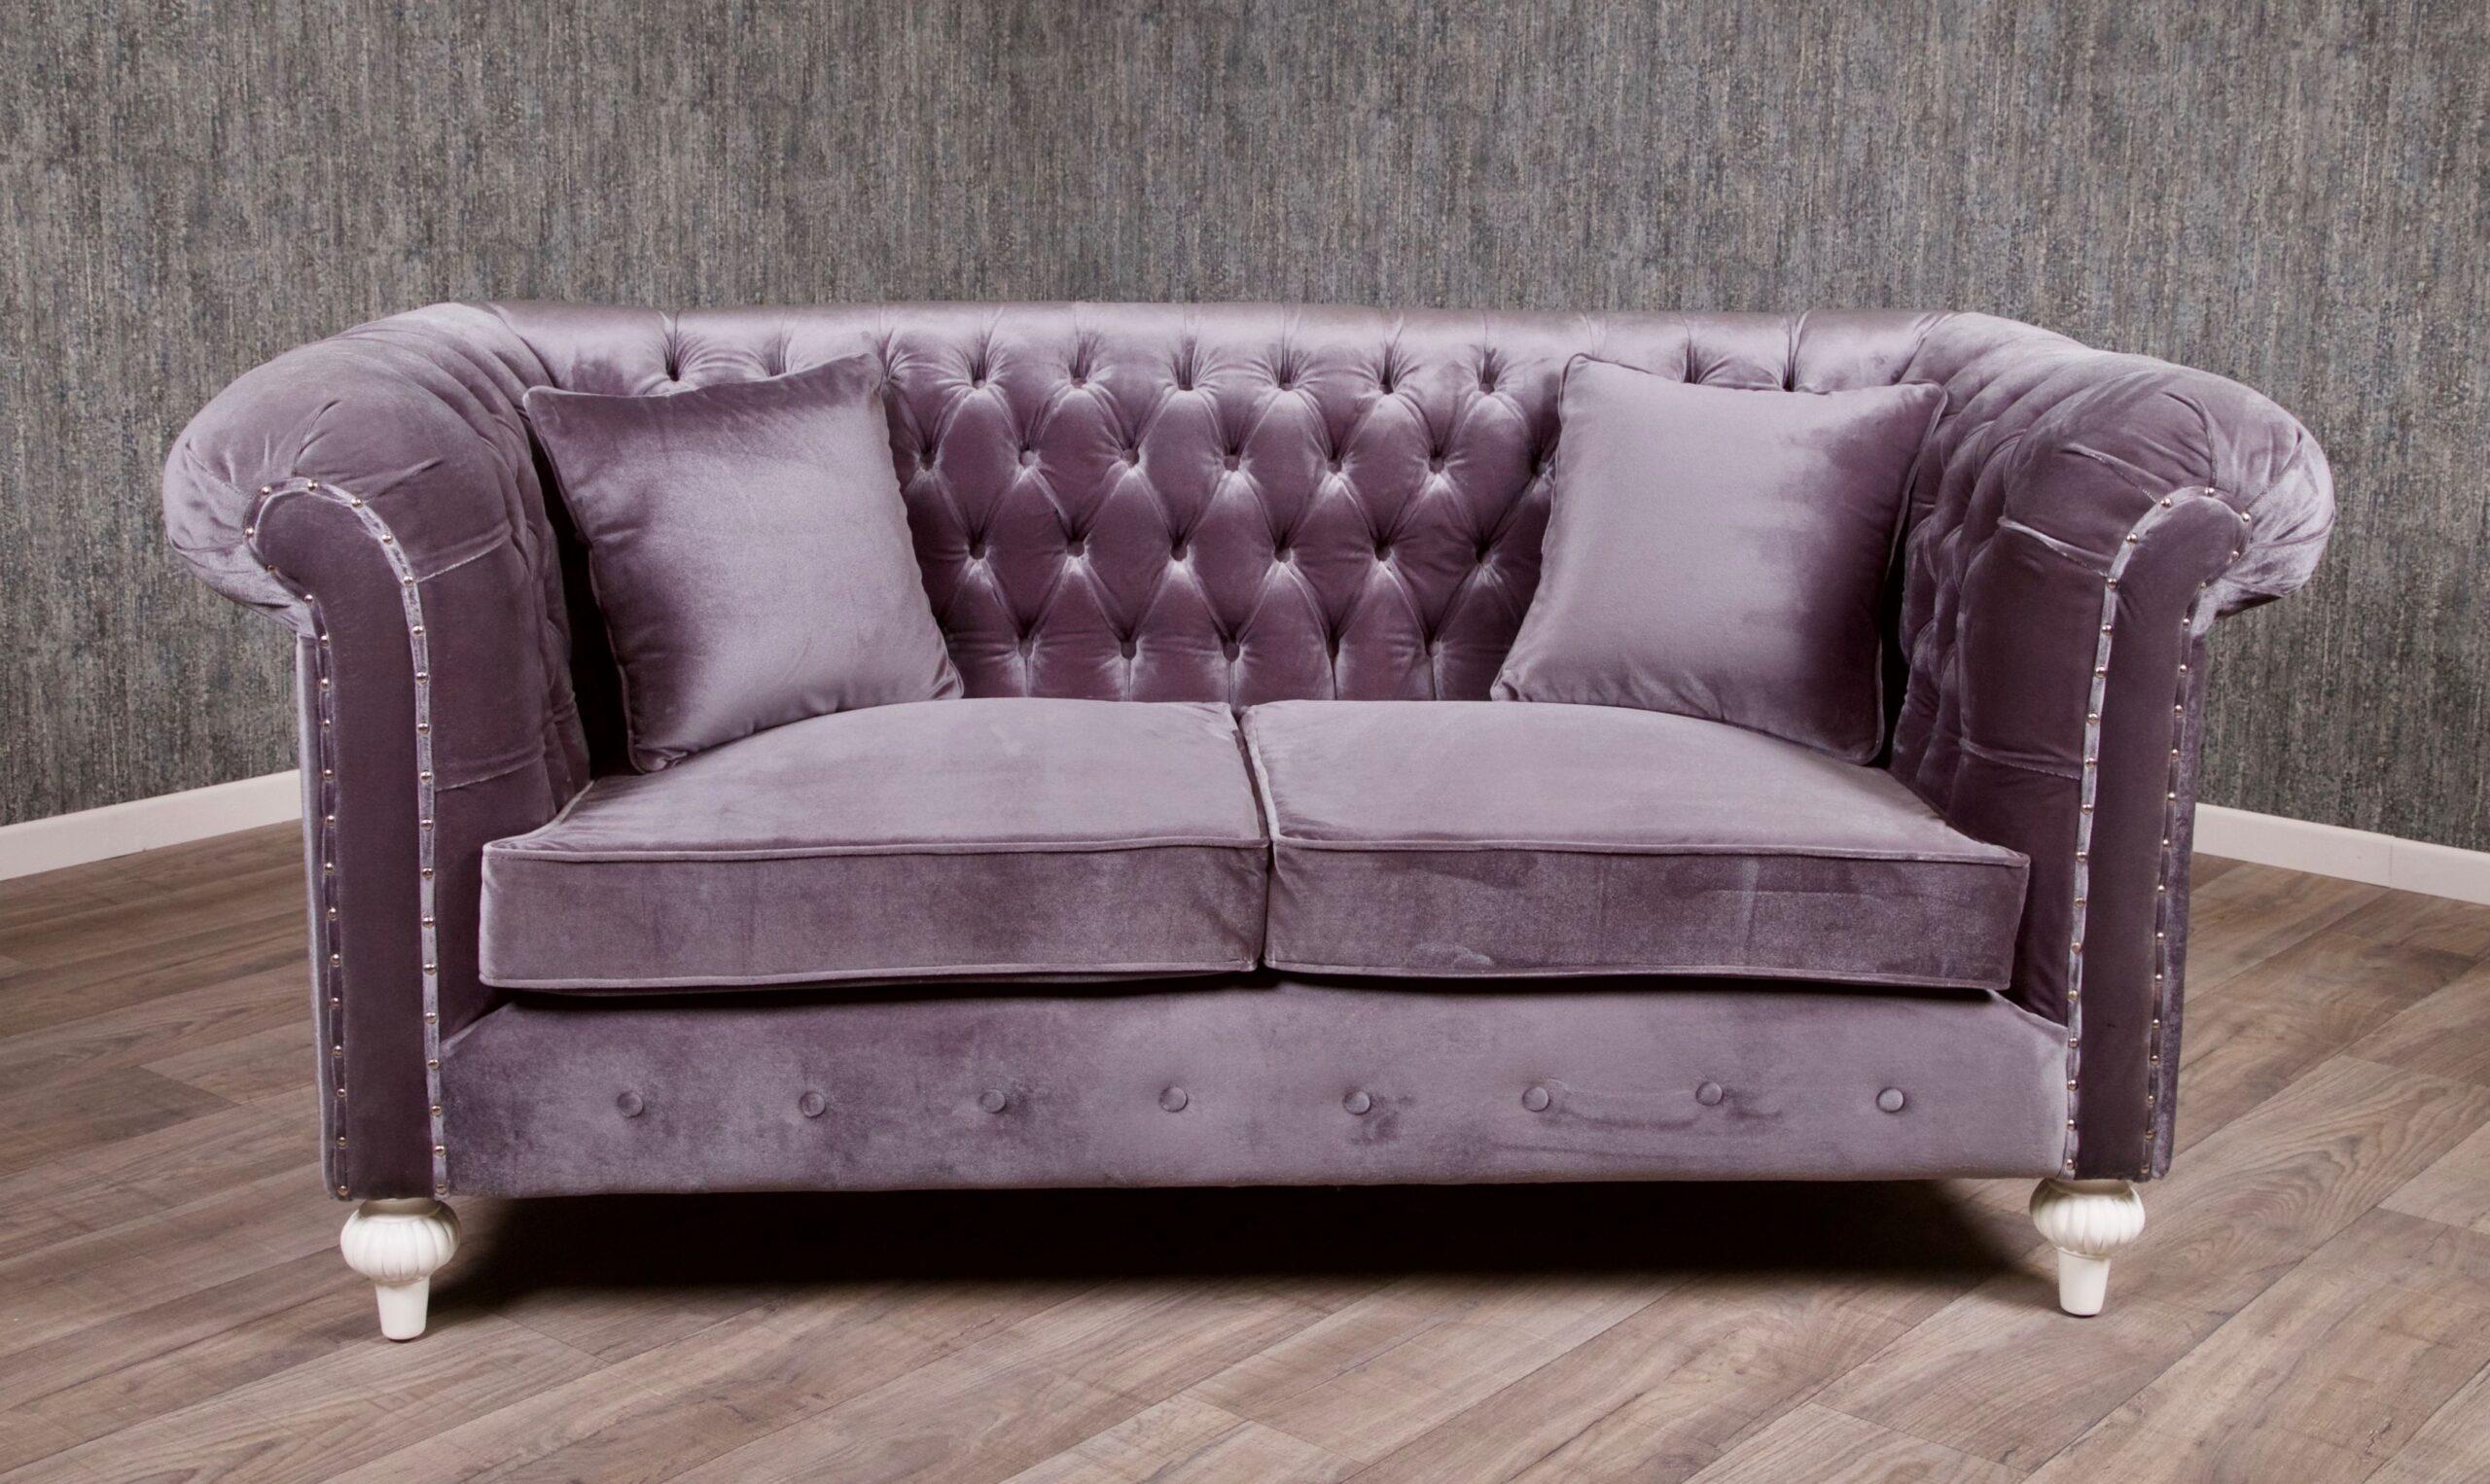 Full Size of Graue Chesterfield Couch Samt Grau Sofa Leder Set 2er Otto 2 Sitzer Stoff Barock Empire Sofas überzug Große Kissen Inhofer Auf Raten 3 Graues Bett Big Xxl Sofa Chesterfield Sofa Grau